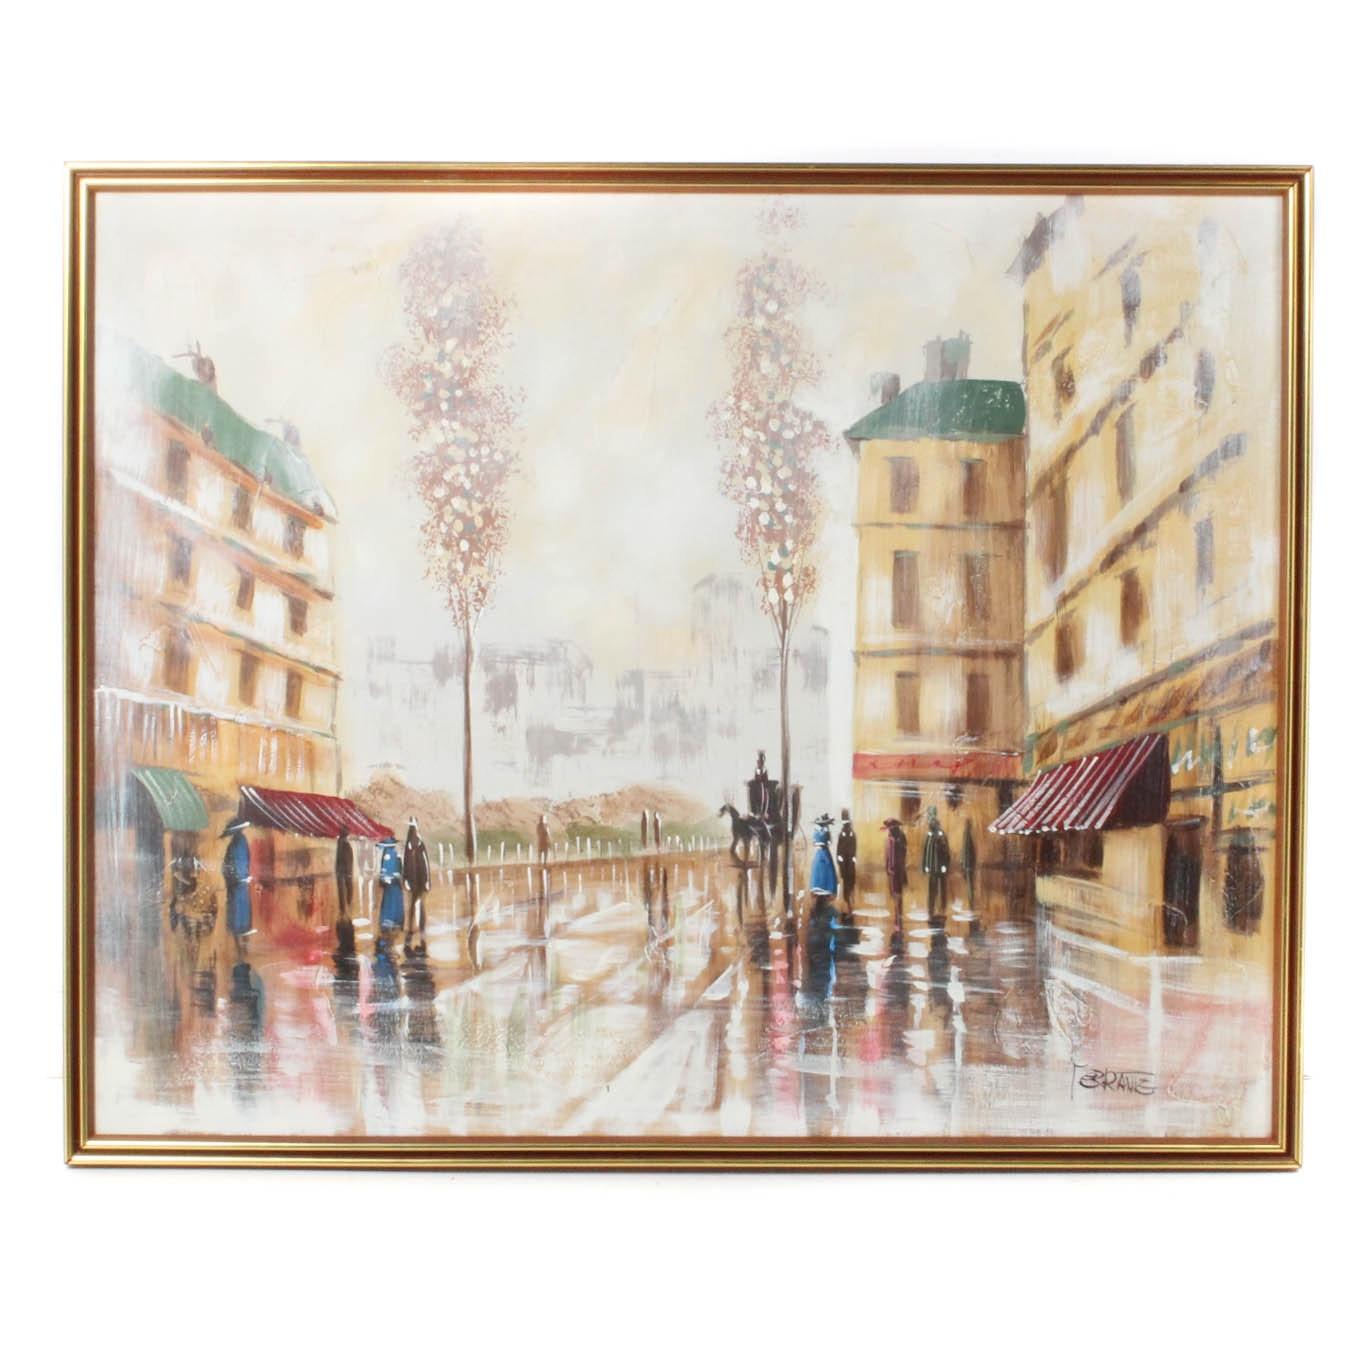 Ferramie Oil on Canvas Street Scene Painting